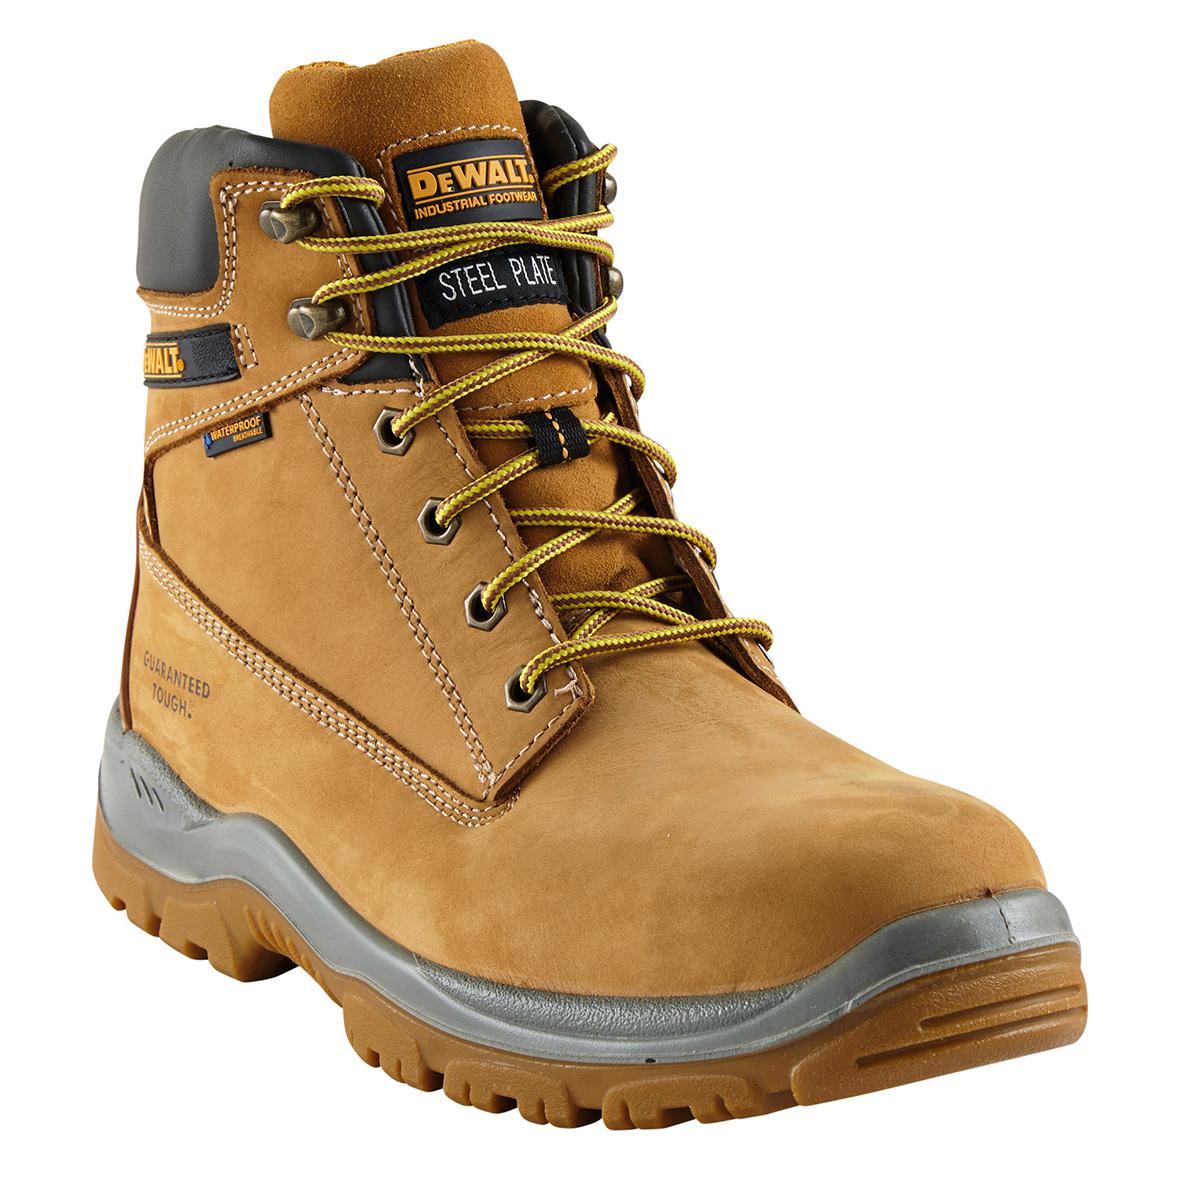 SF0011_WHEAT_DeWalt_Titanium_Safety_Boots